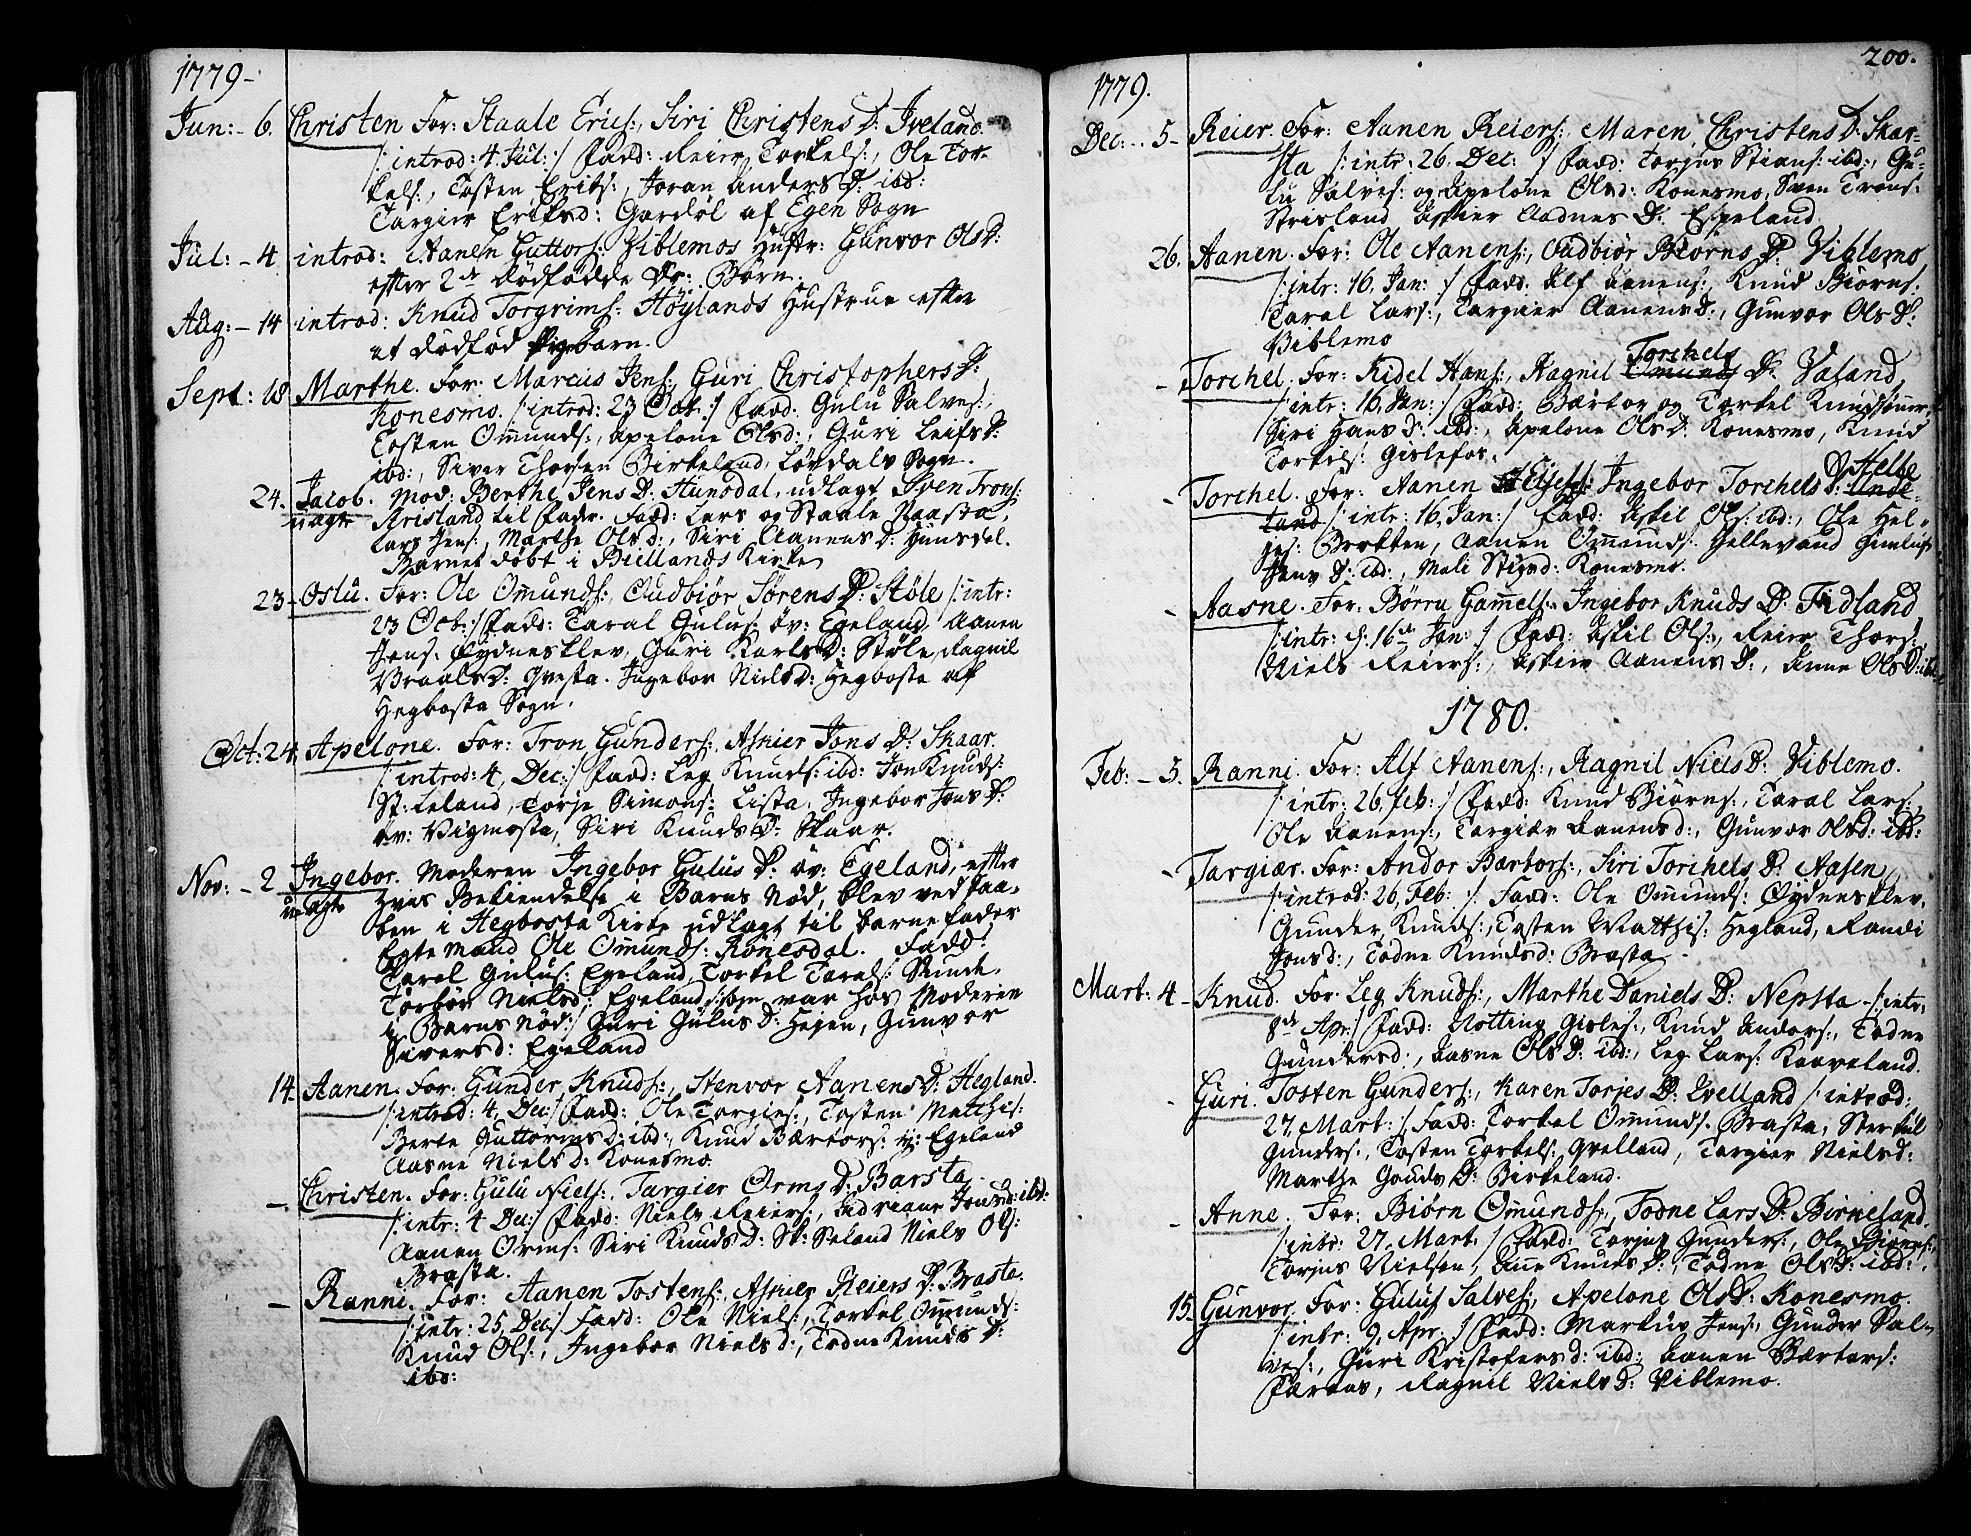 SAK, Sør-Audnedal sokneprestkontor, F/Fa/Fab/L0002: Ministerialbok nr. A 2 /4, 1768-1814, s. 200